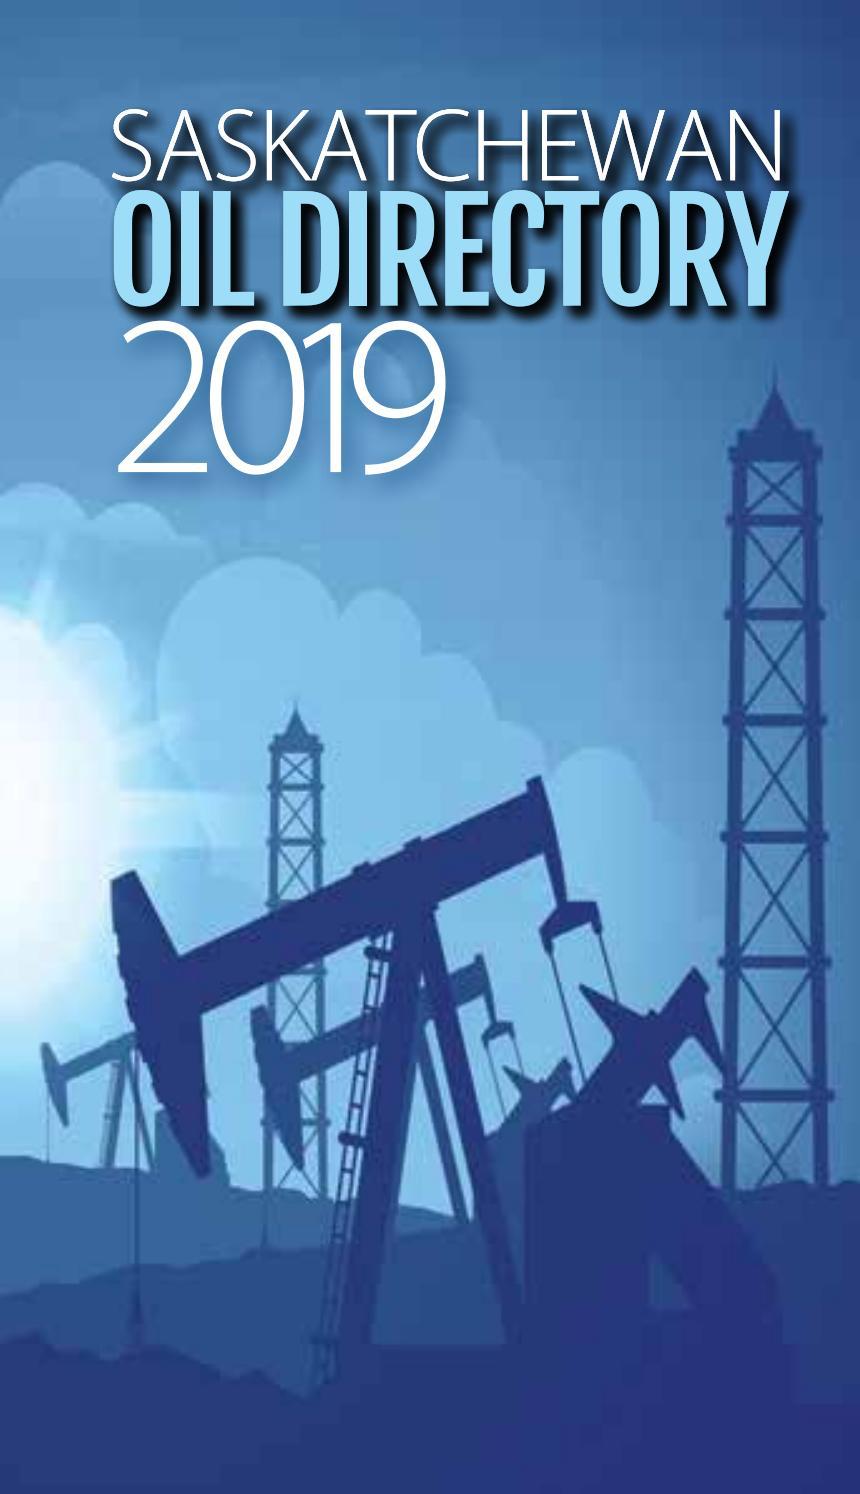 Saskatchewan Oil Directory 2019 by DEL Communications Inc